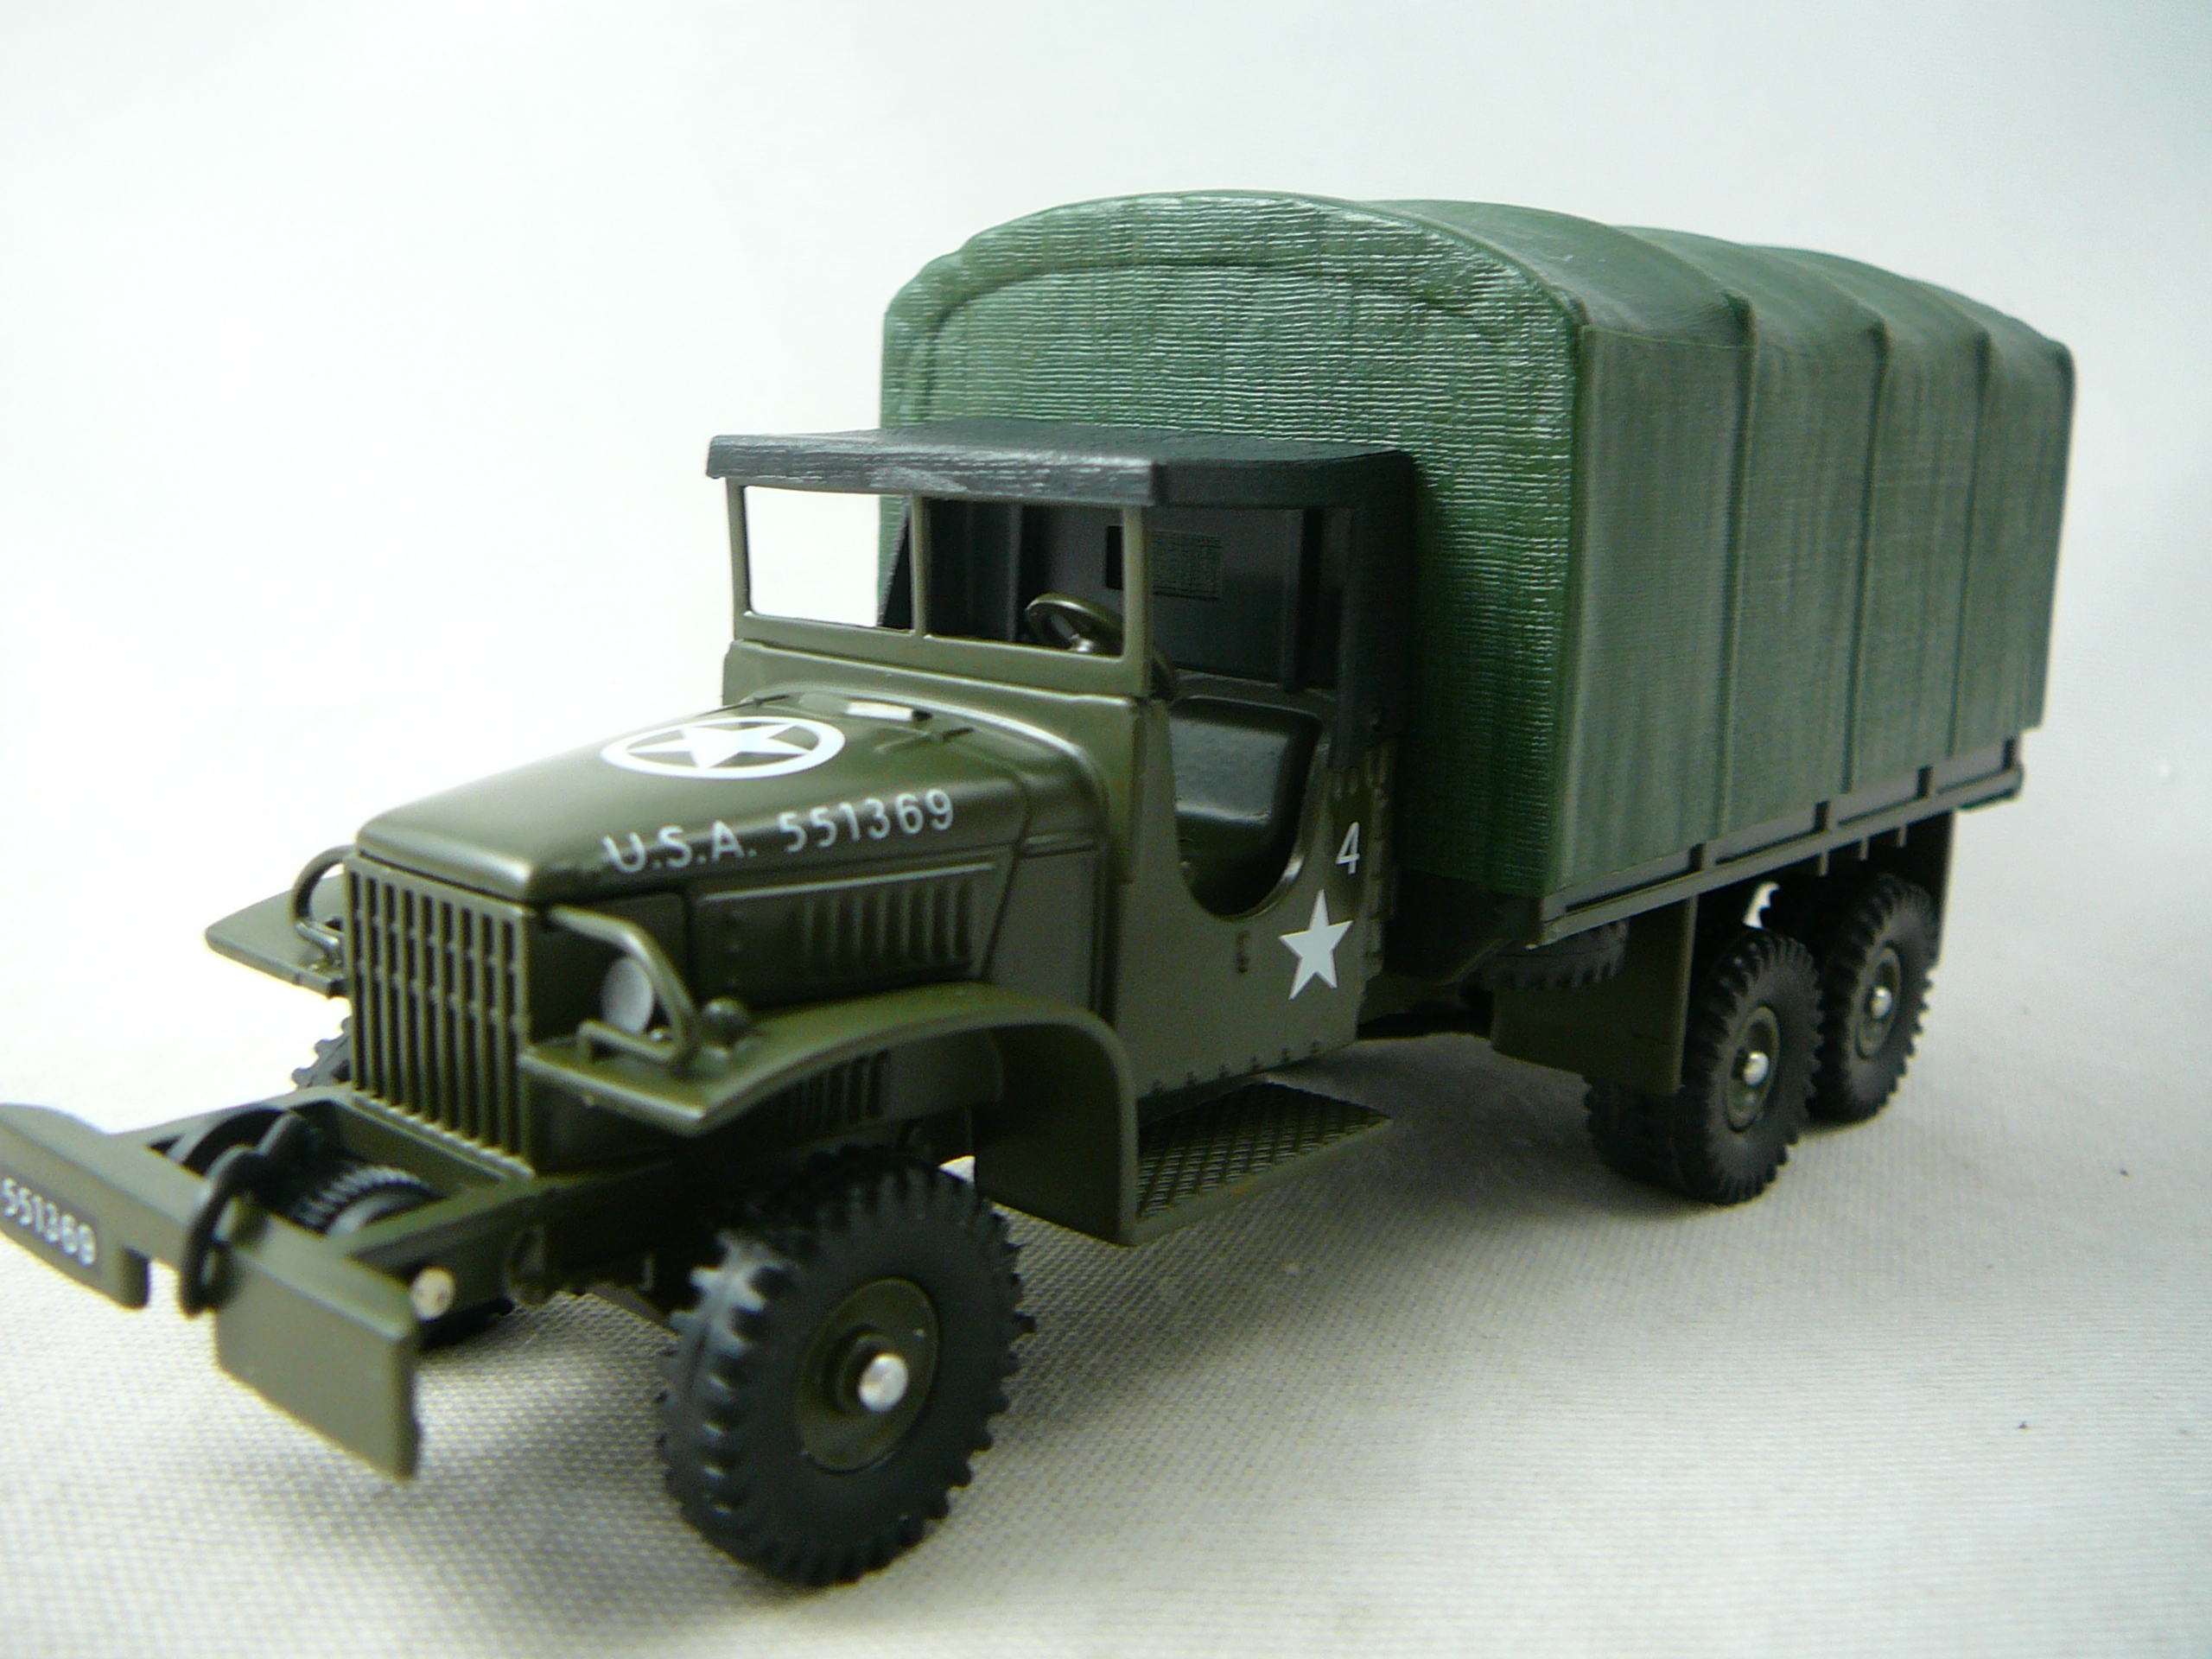 Gmc Cckw Arm 233 E Miniature 1 43 Cij Cij 80602 Freeway01